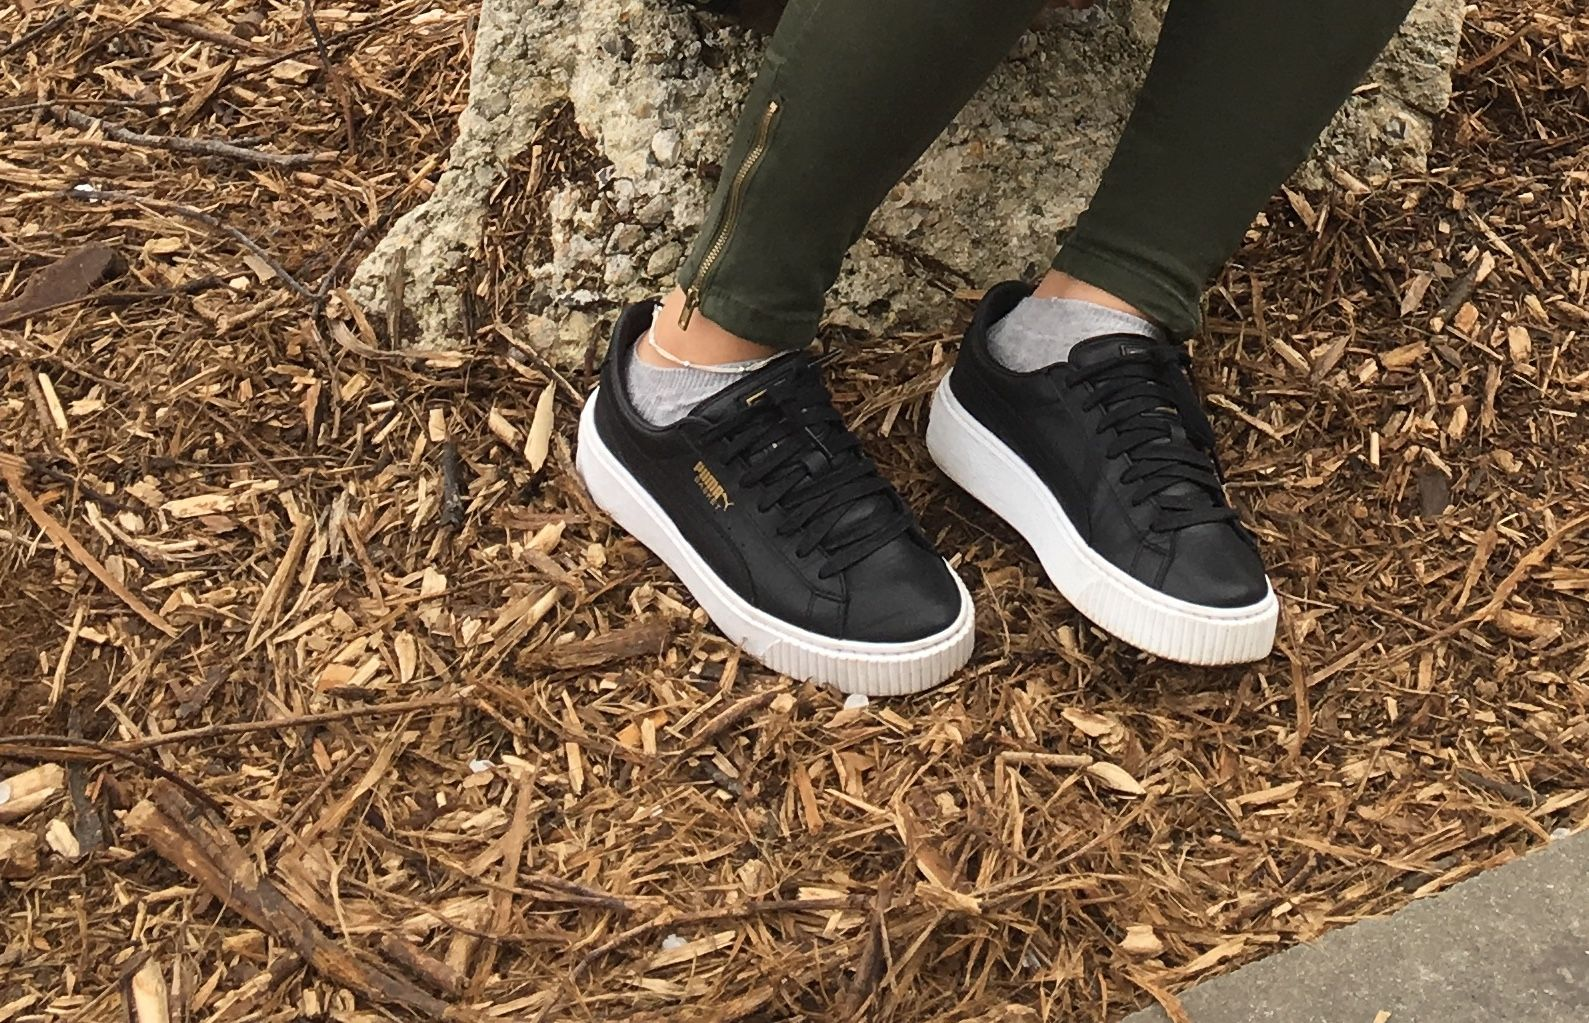 premium selection 9a6ec bc3a4 Platform Puma Some Basket Leather Wear Comfy To Sneakers nAHPB